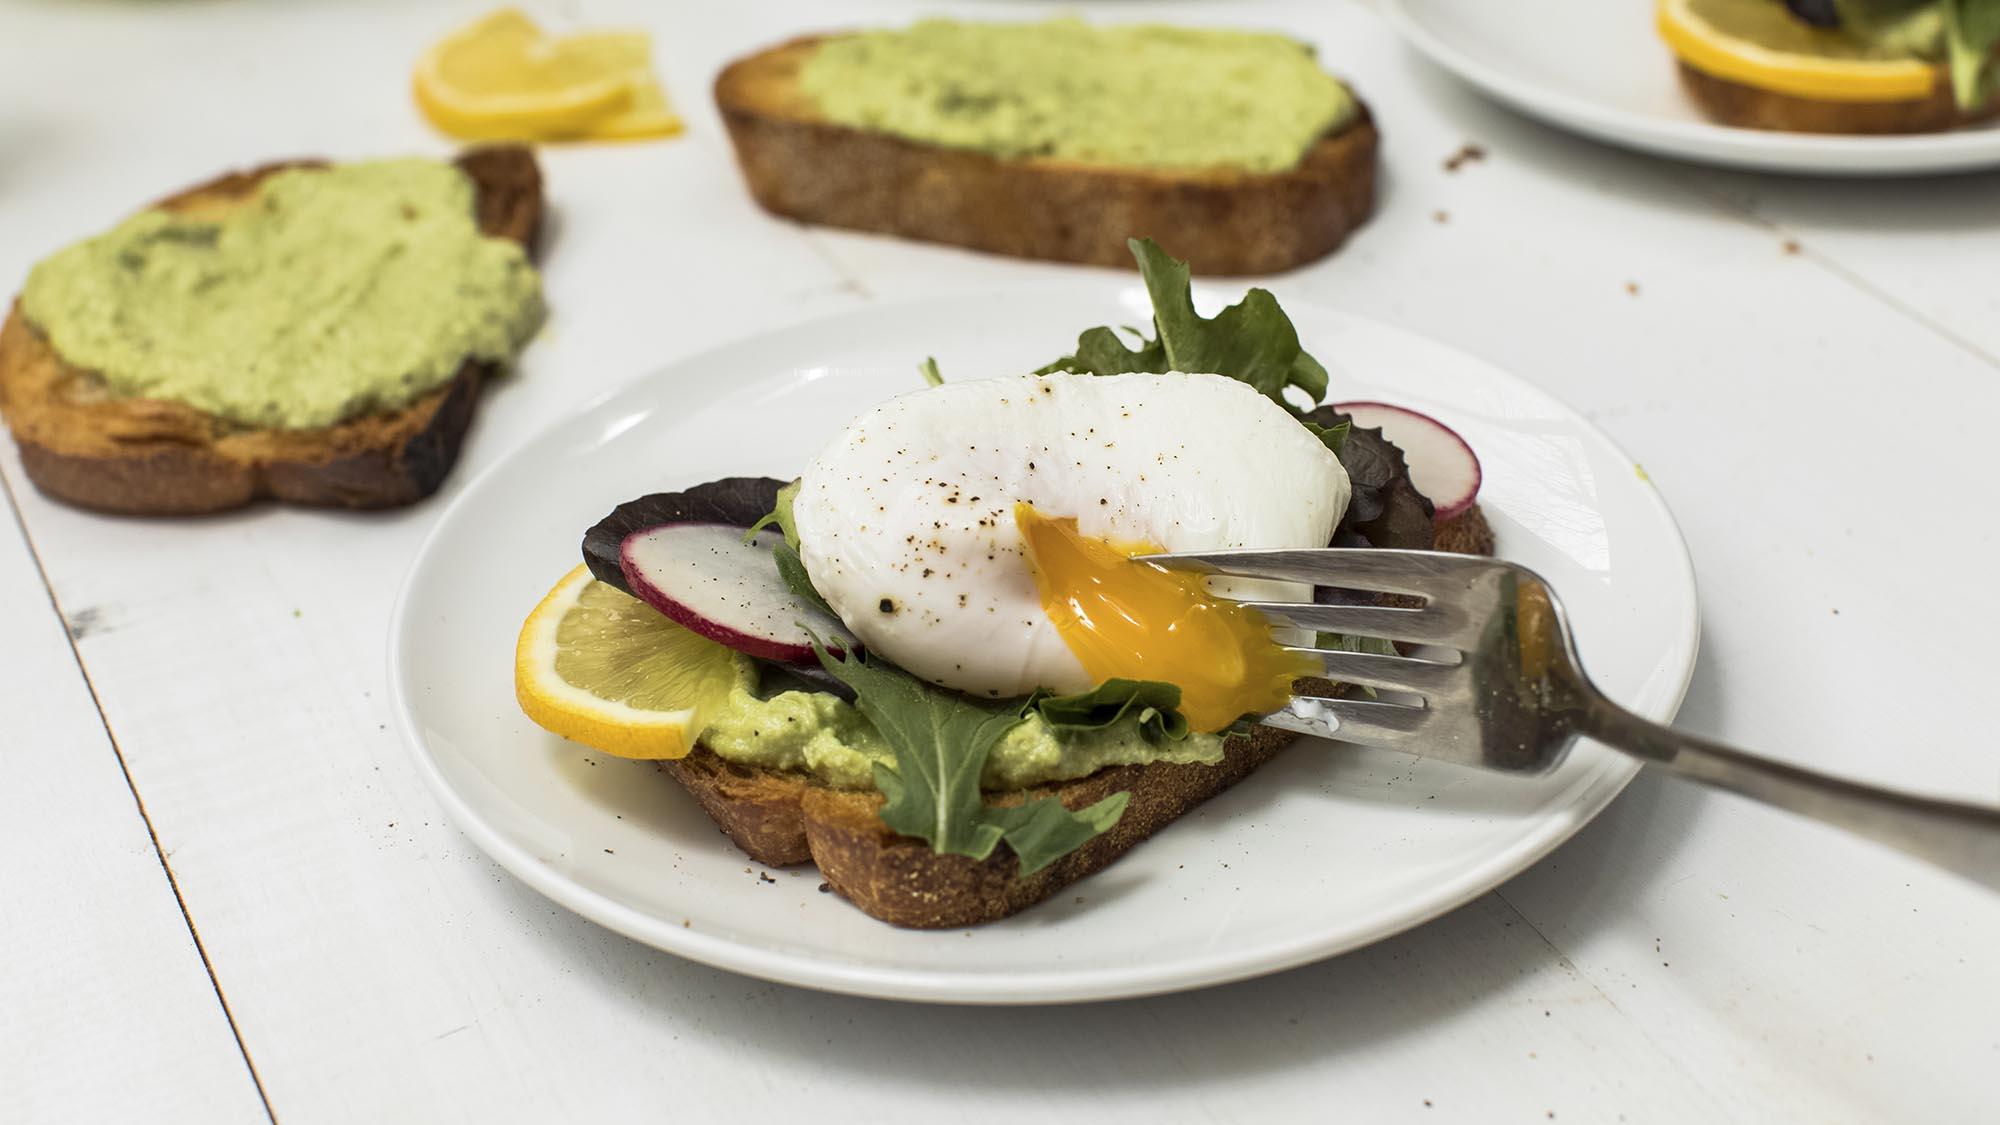 Avocado_Ricotta_Toast_With_Poached_Eggs_2000x1125.jpg